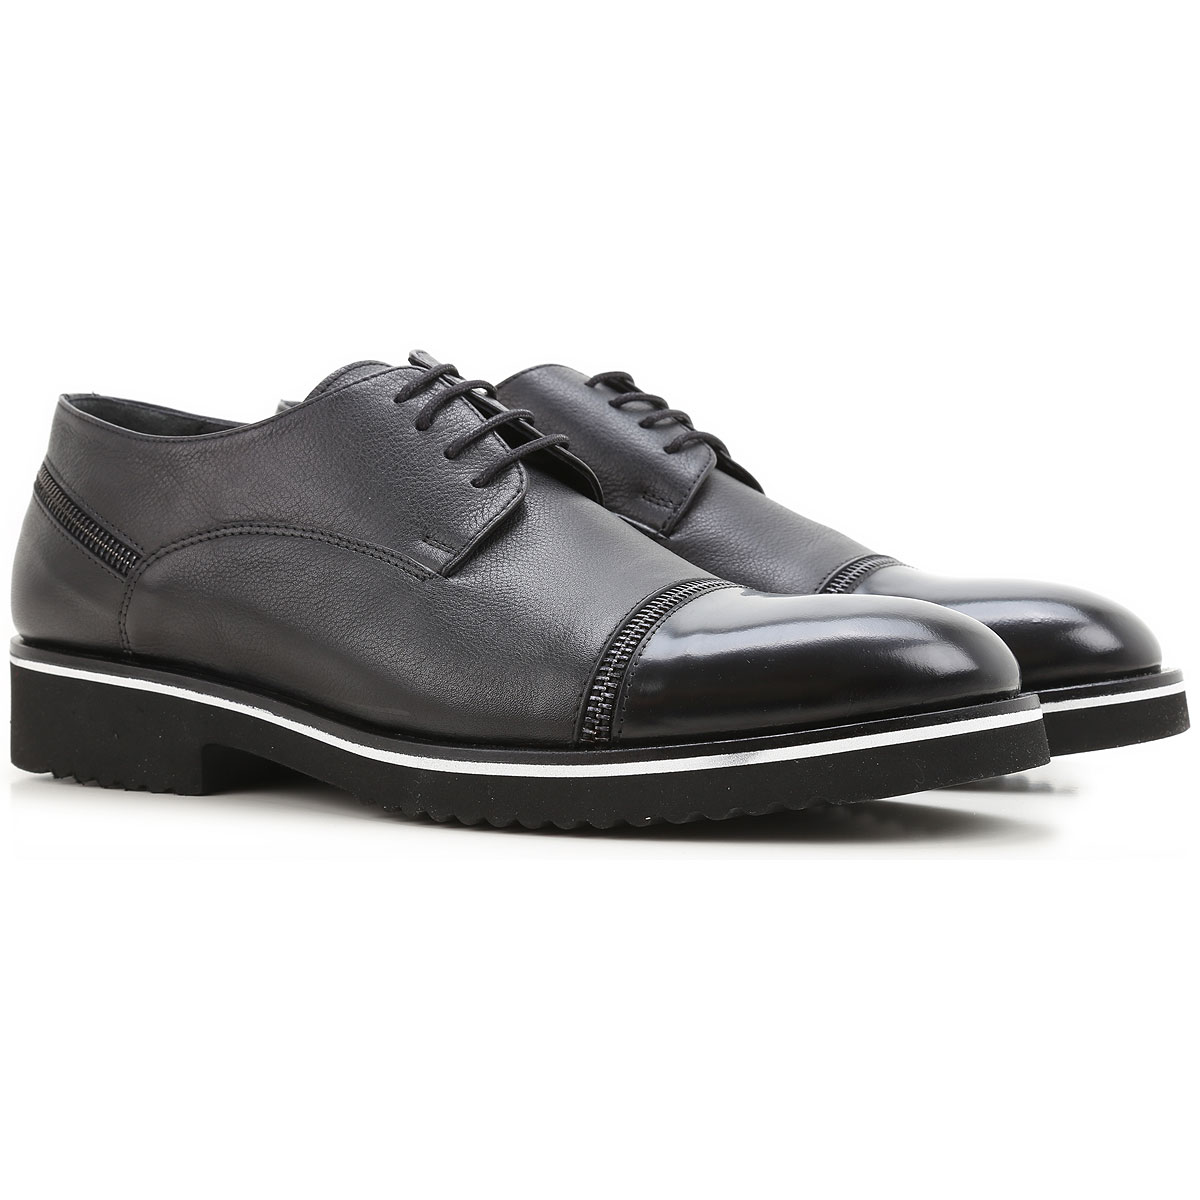 chaussures homme karl lagerfeld code produit 556 128 130. Black Bedroom Furniture Sets. Home Design Ideas